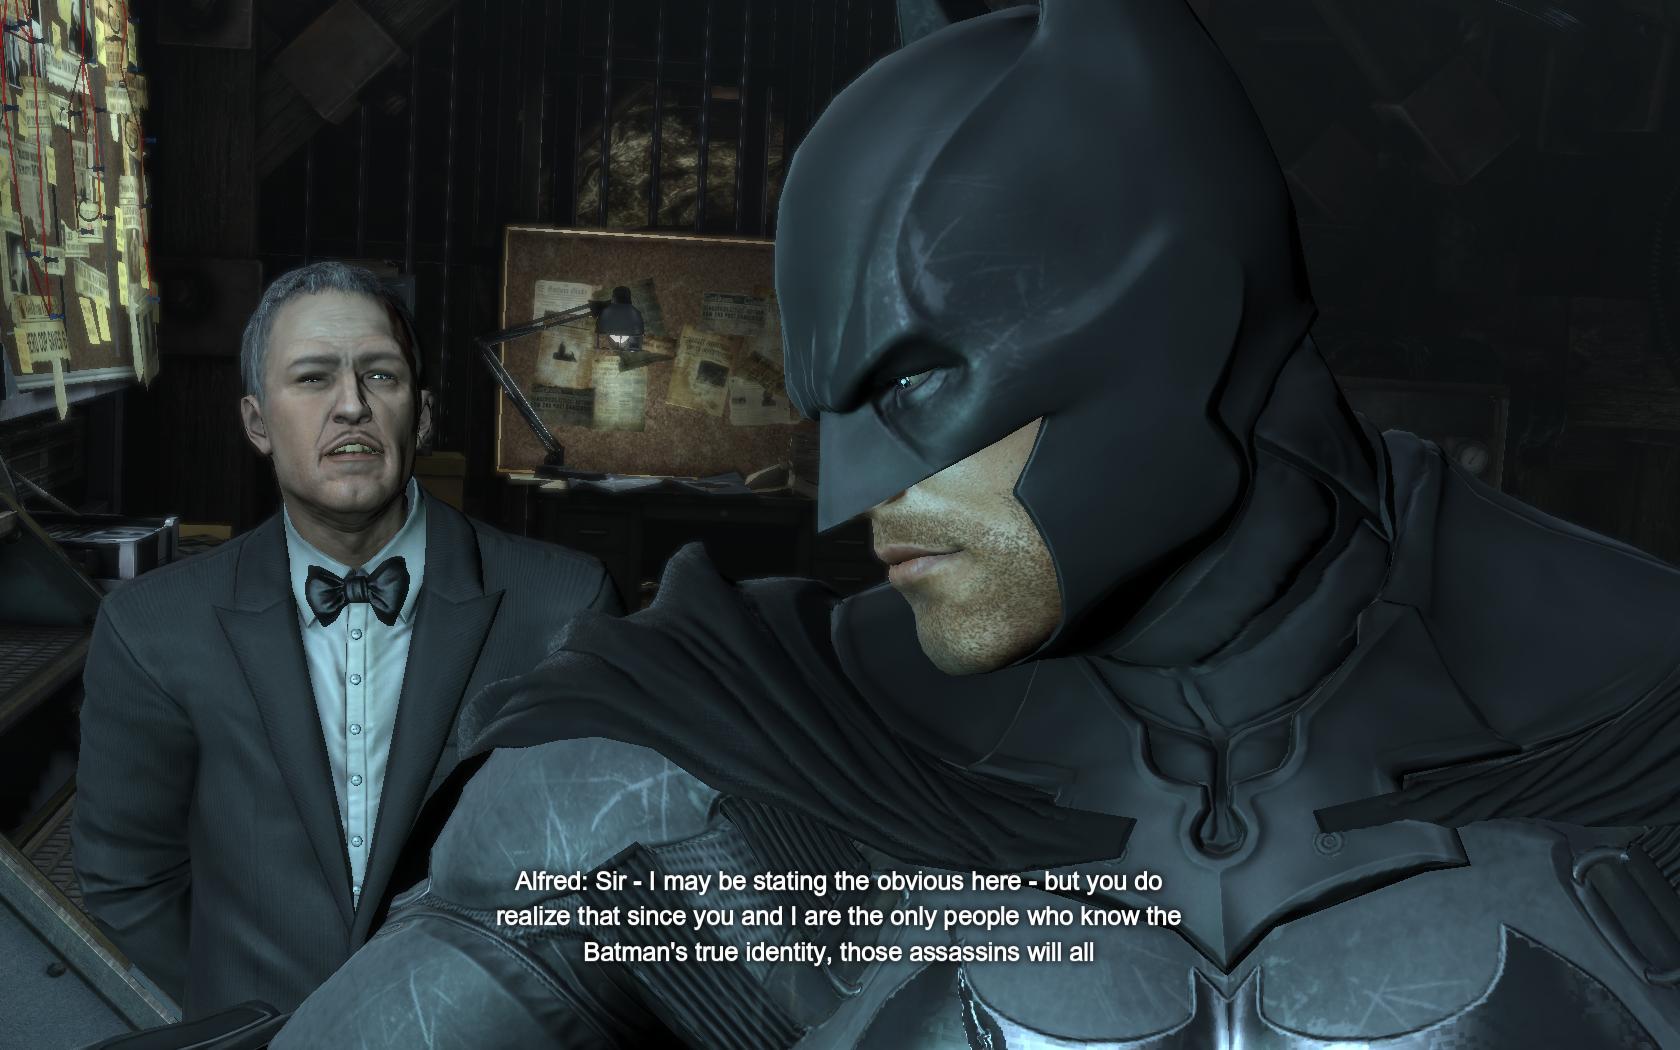 BatmanOrigins 2013-12-12 00-12-33-97.jpg